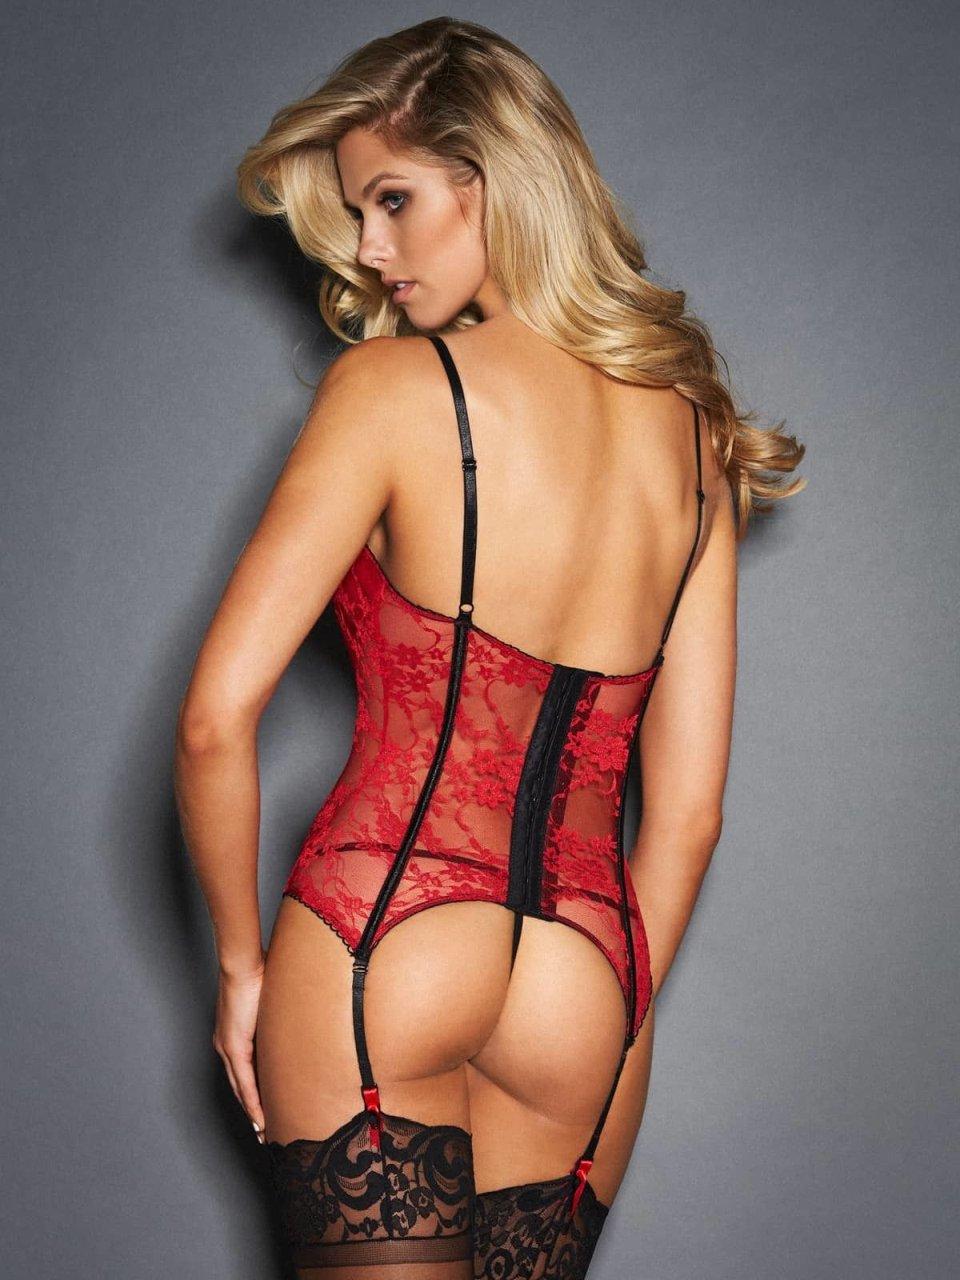 Natalie Jayne Roser Nude Sexy - 9 Photos - 2019 year